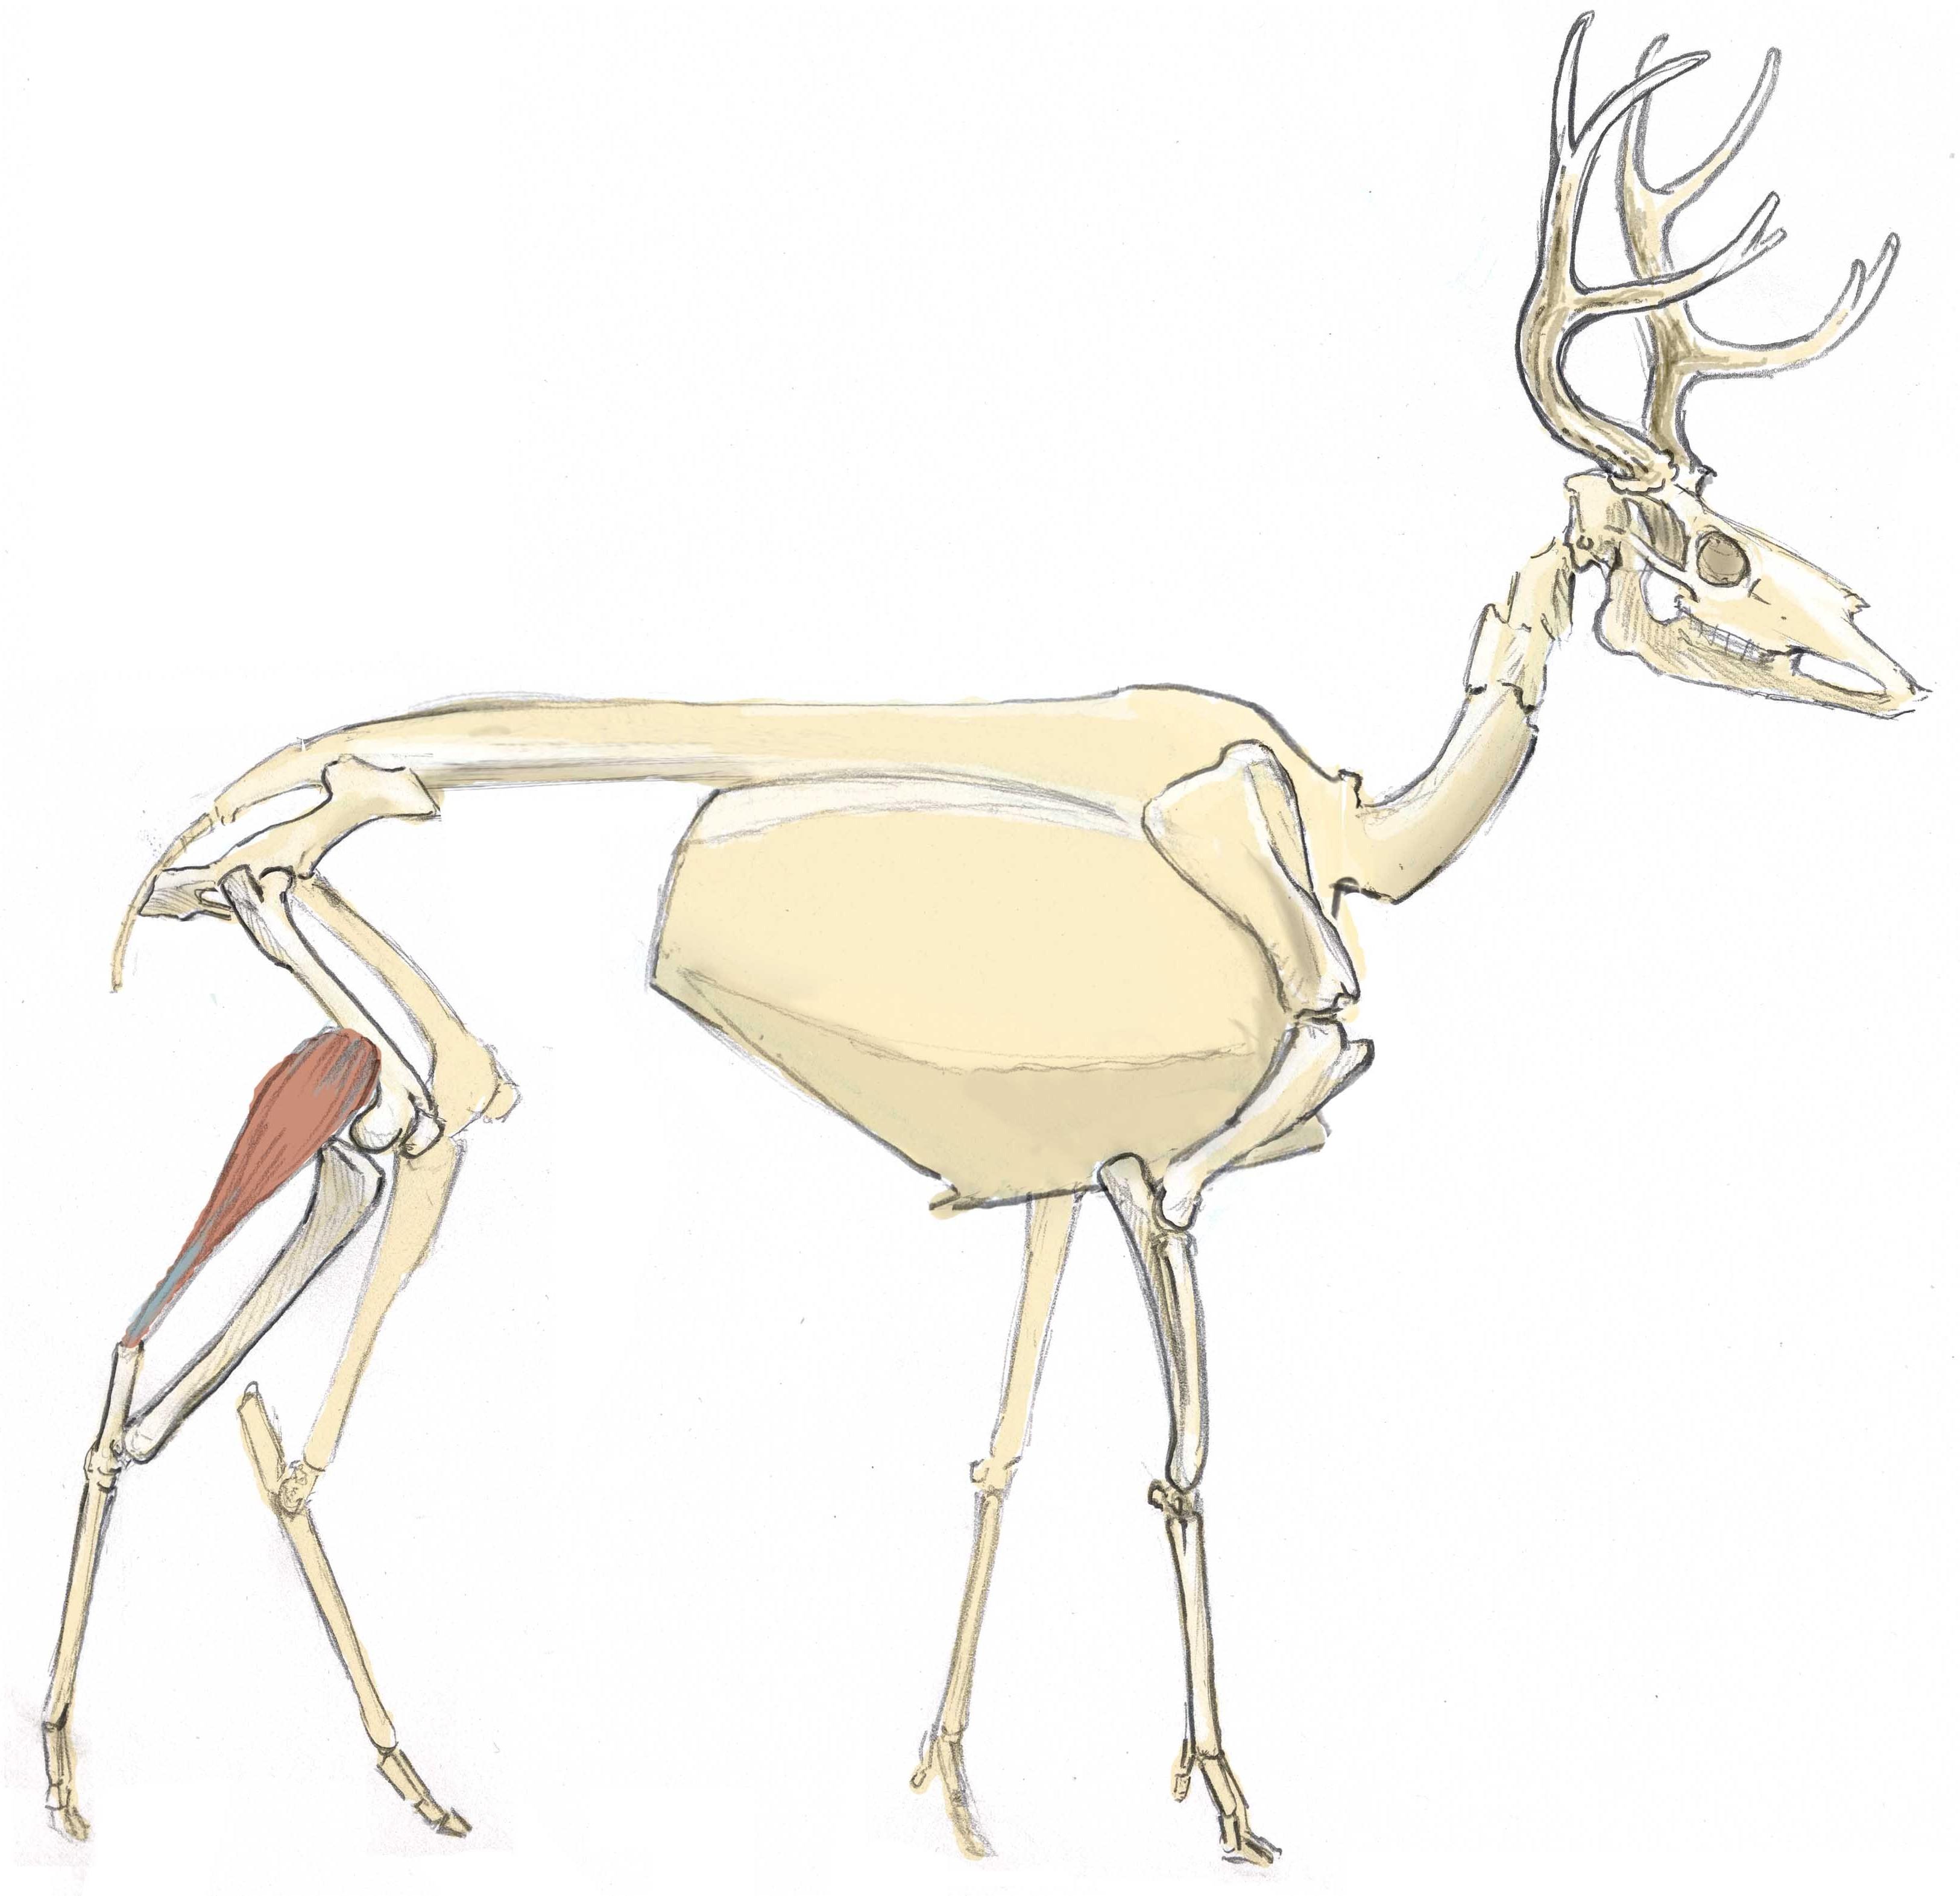 Mule Deer Skull Drawing At Getdrawings Free For Personal Use